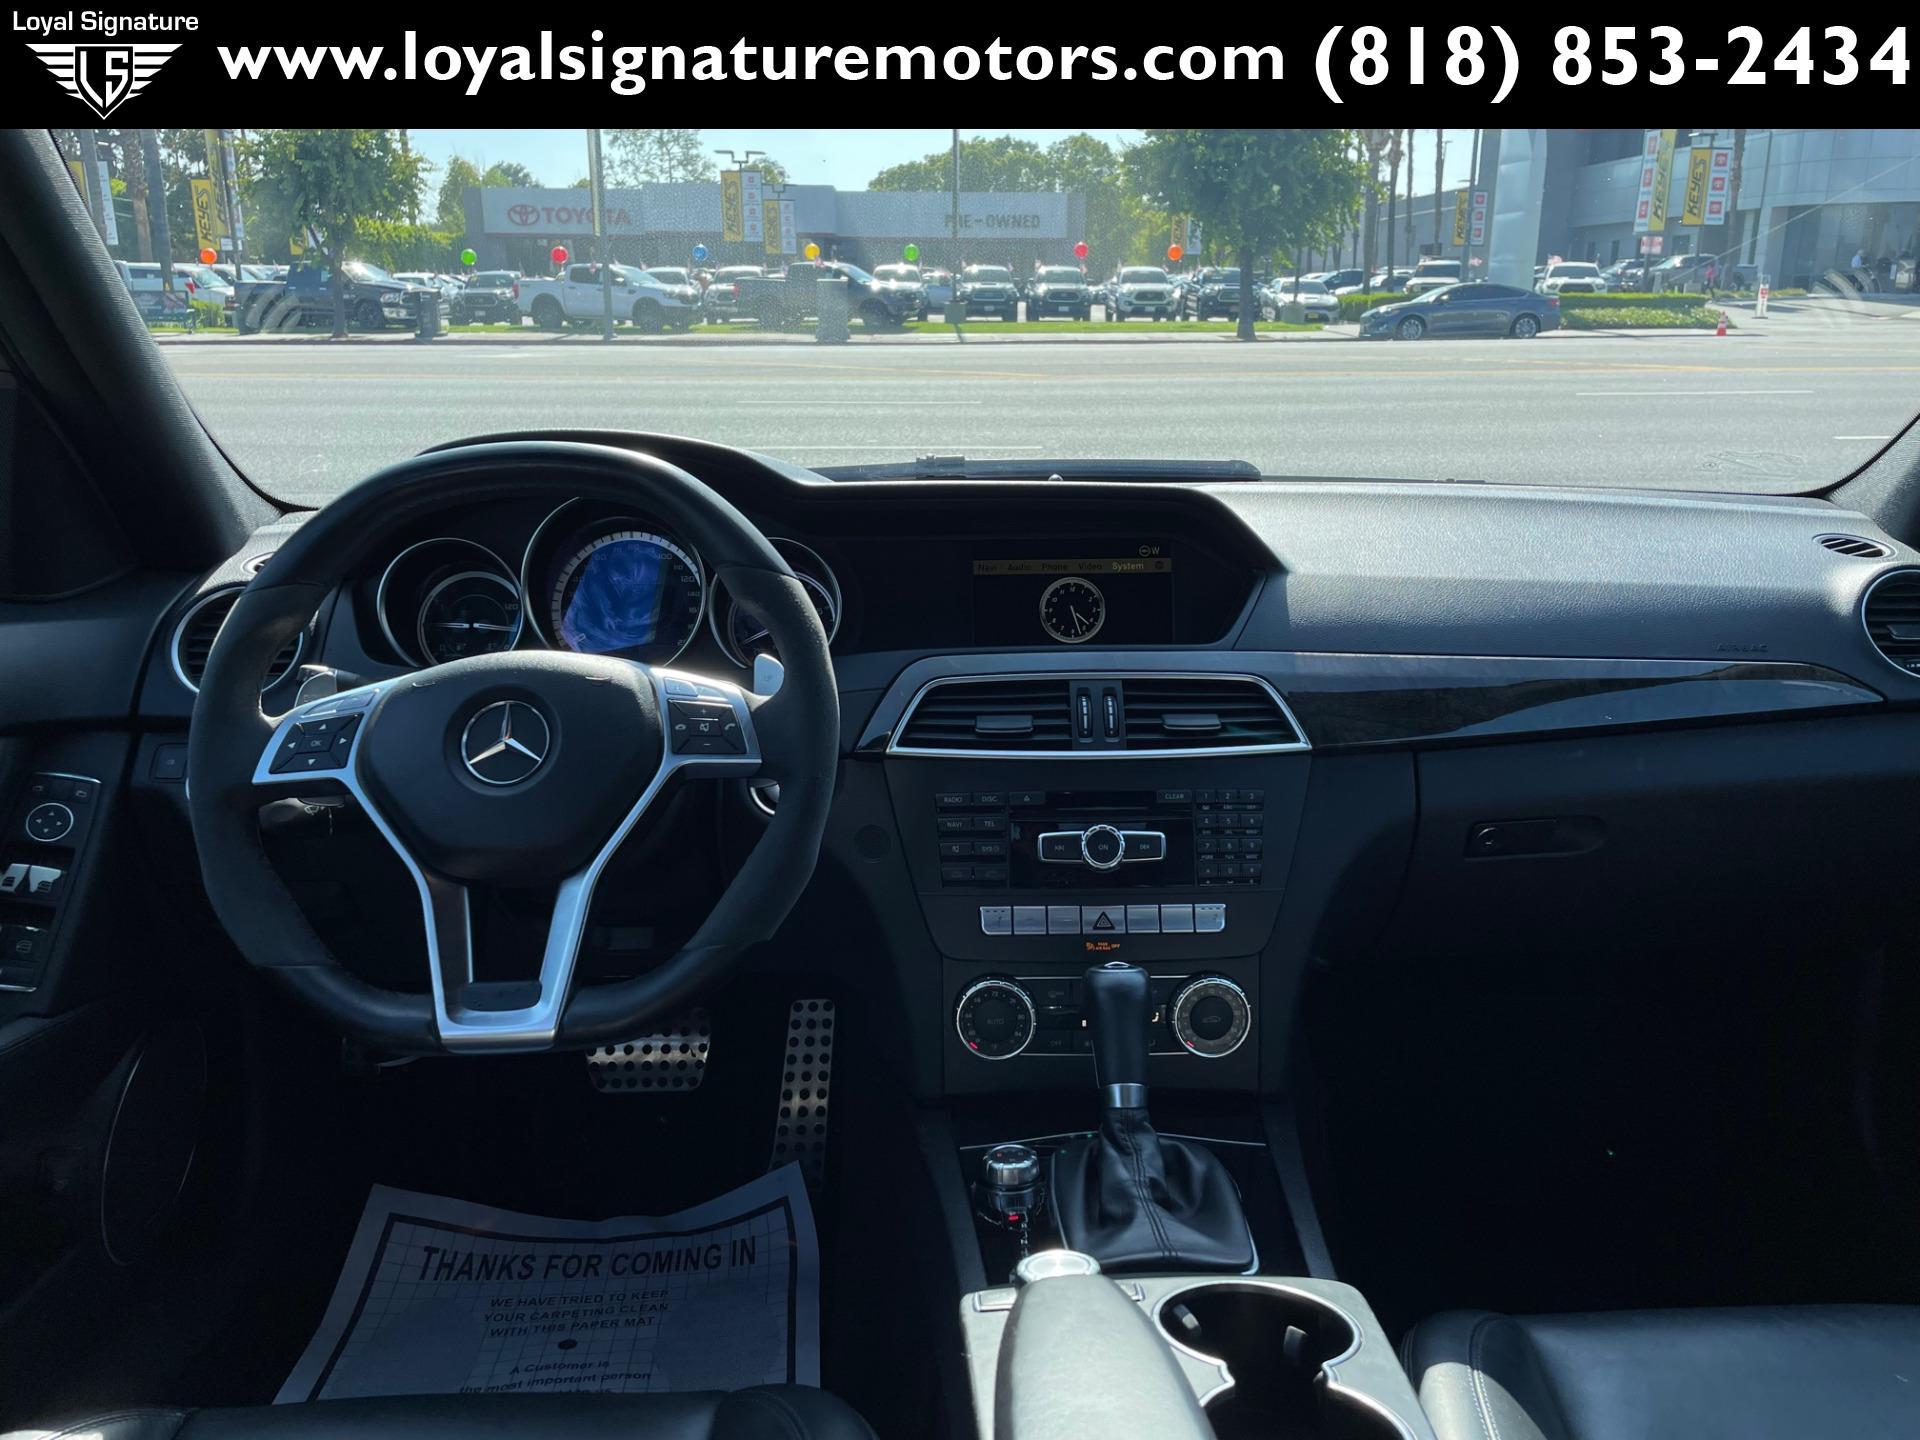 Used-2012-Mercedes-Benz-C-Class-C-63-AMG